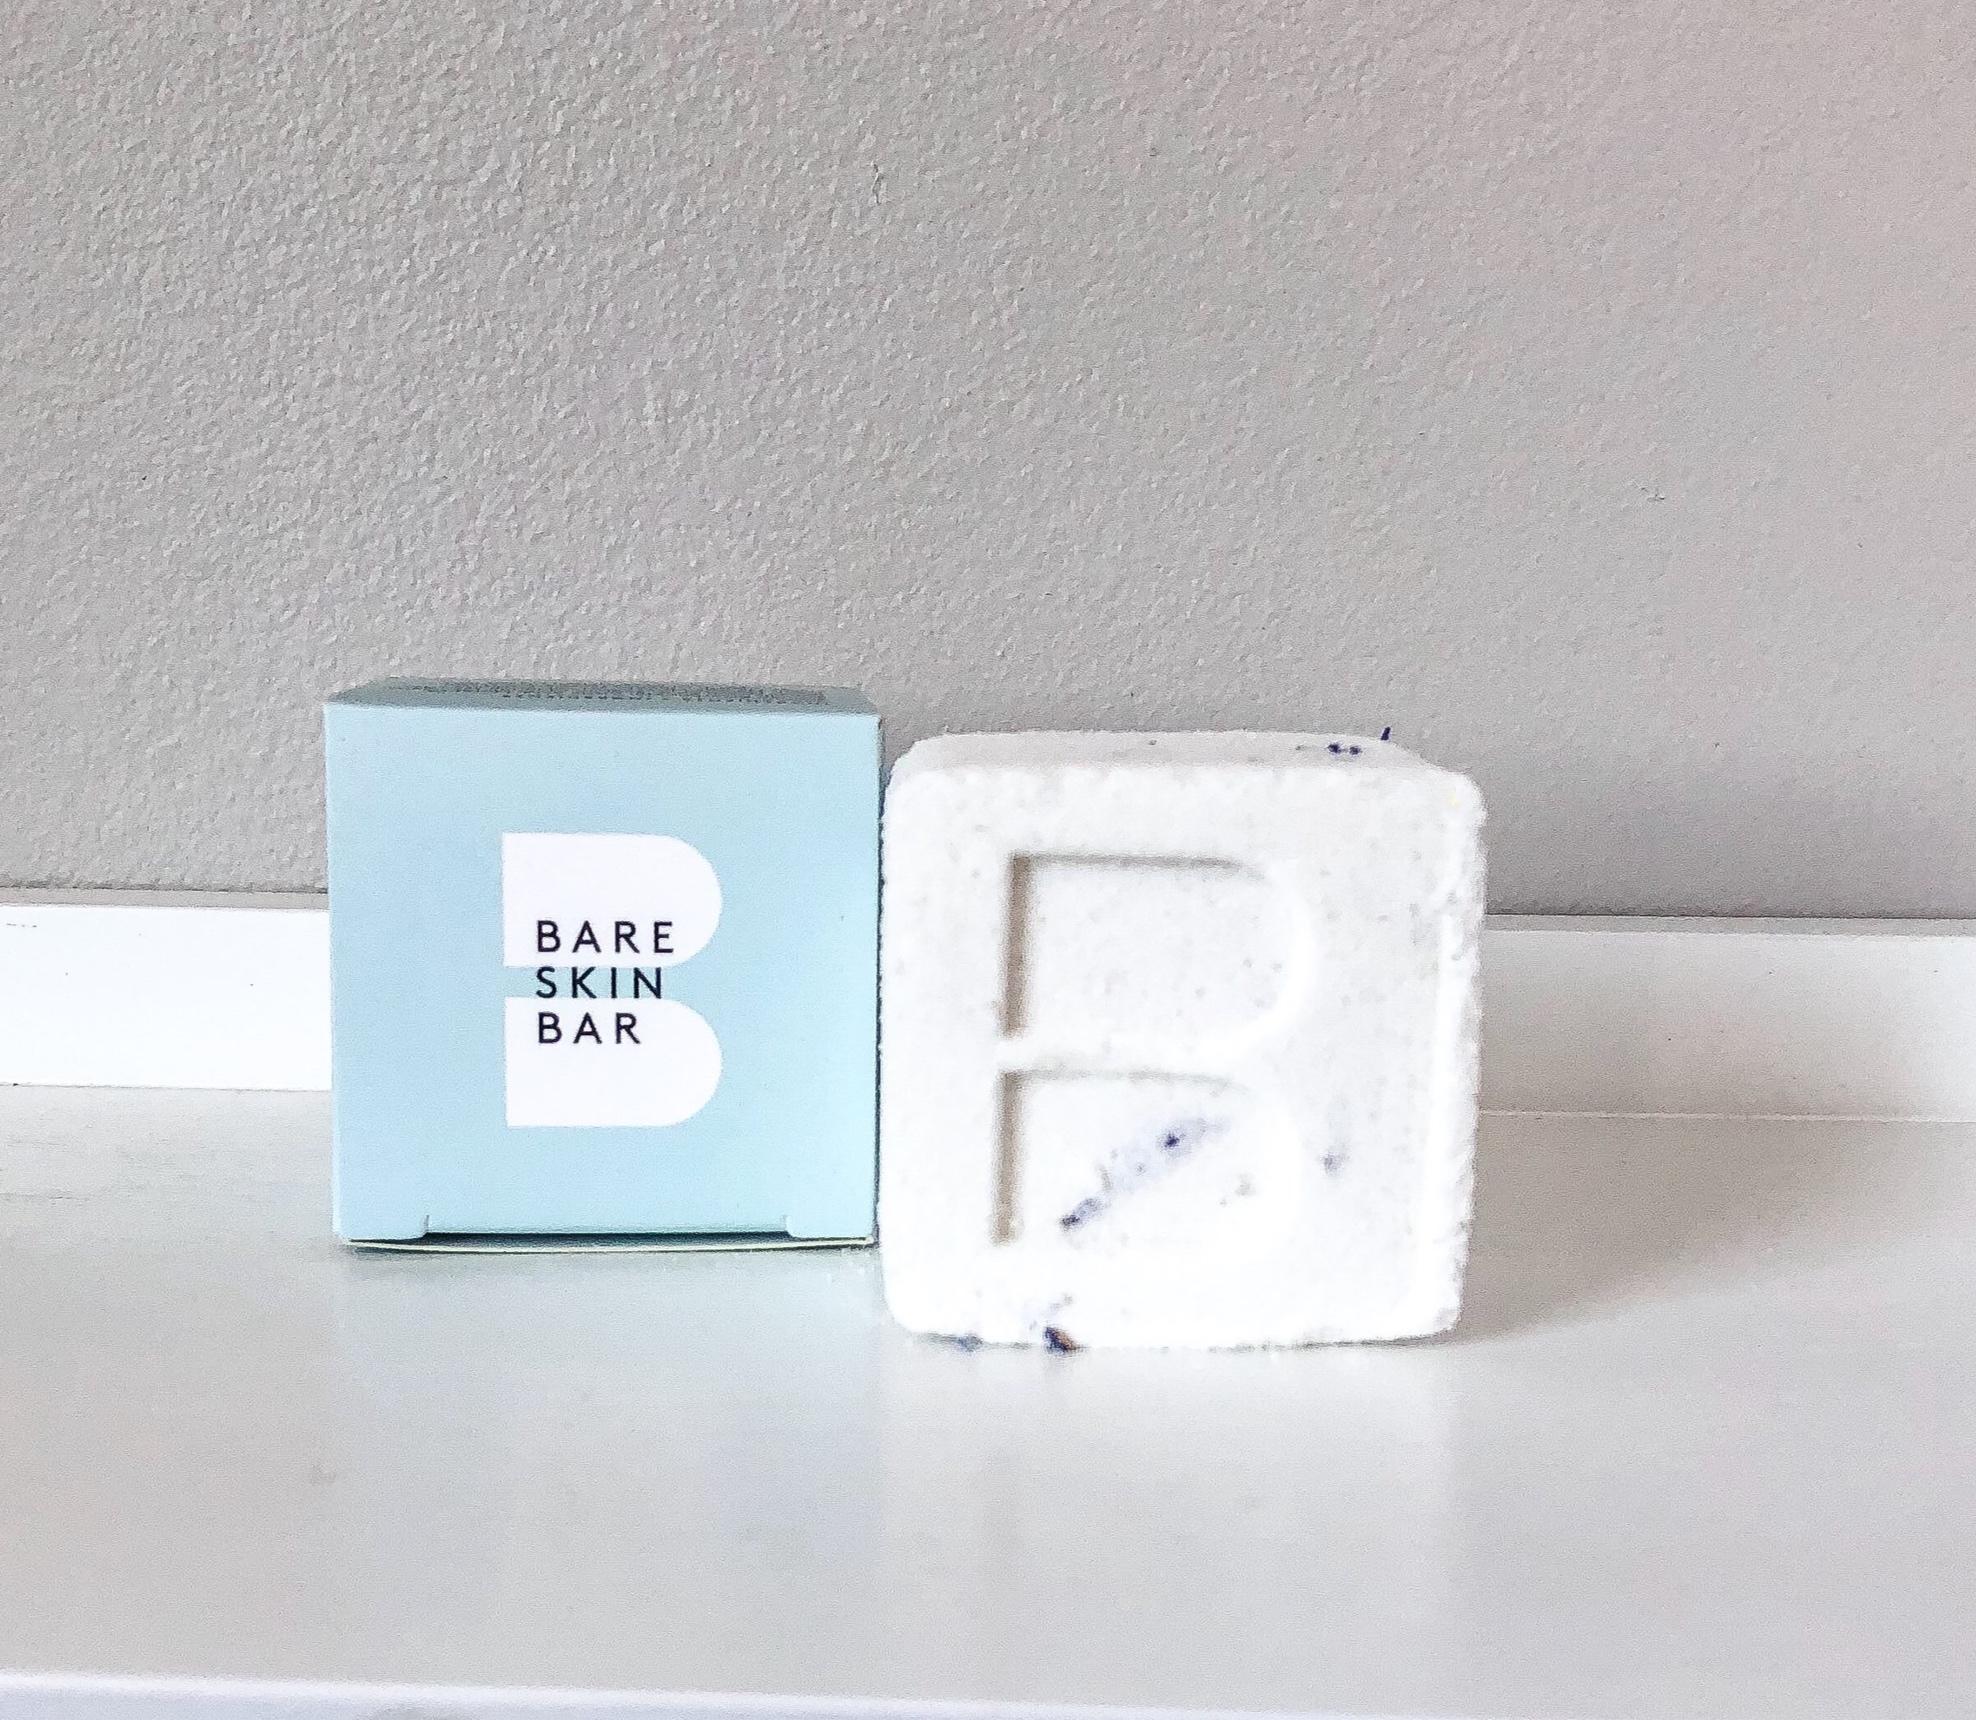 Bare Skin Bar Detox Single $6.50